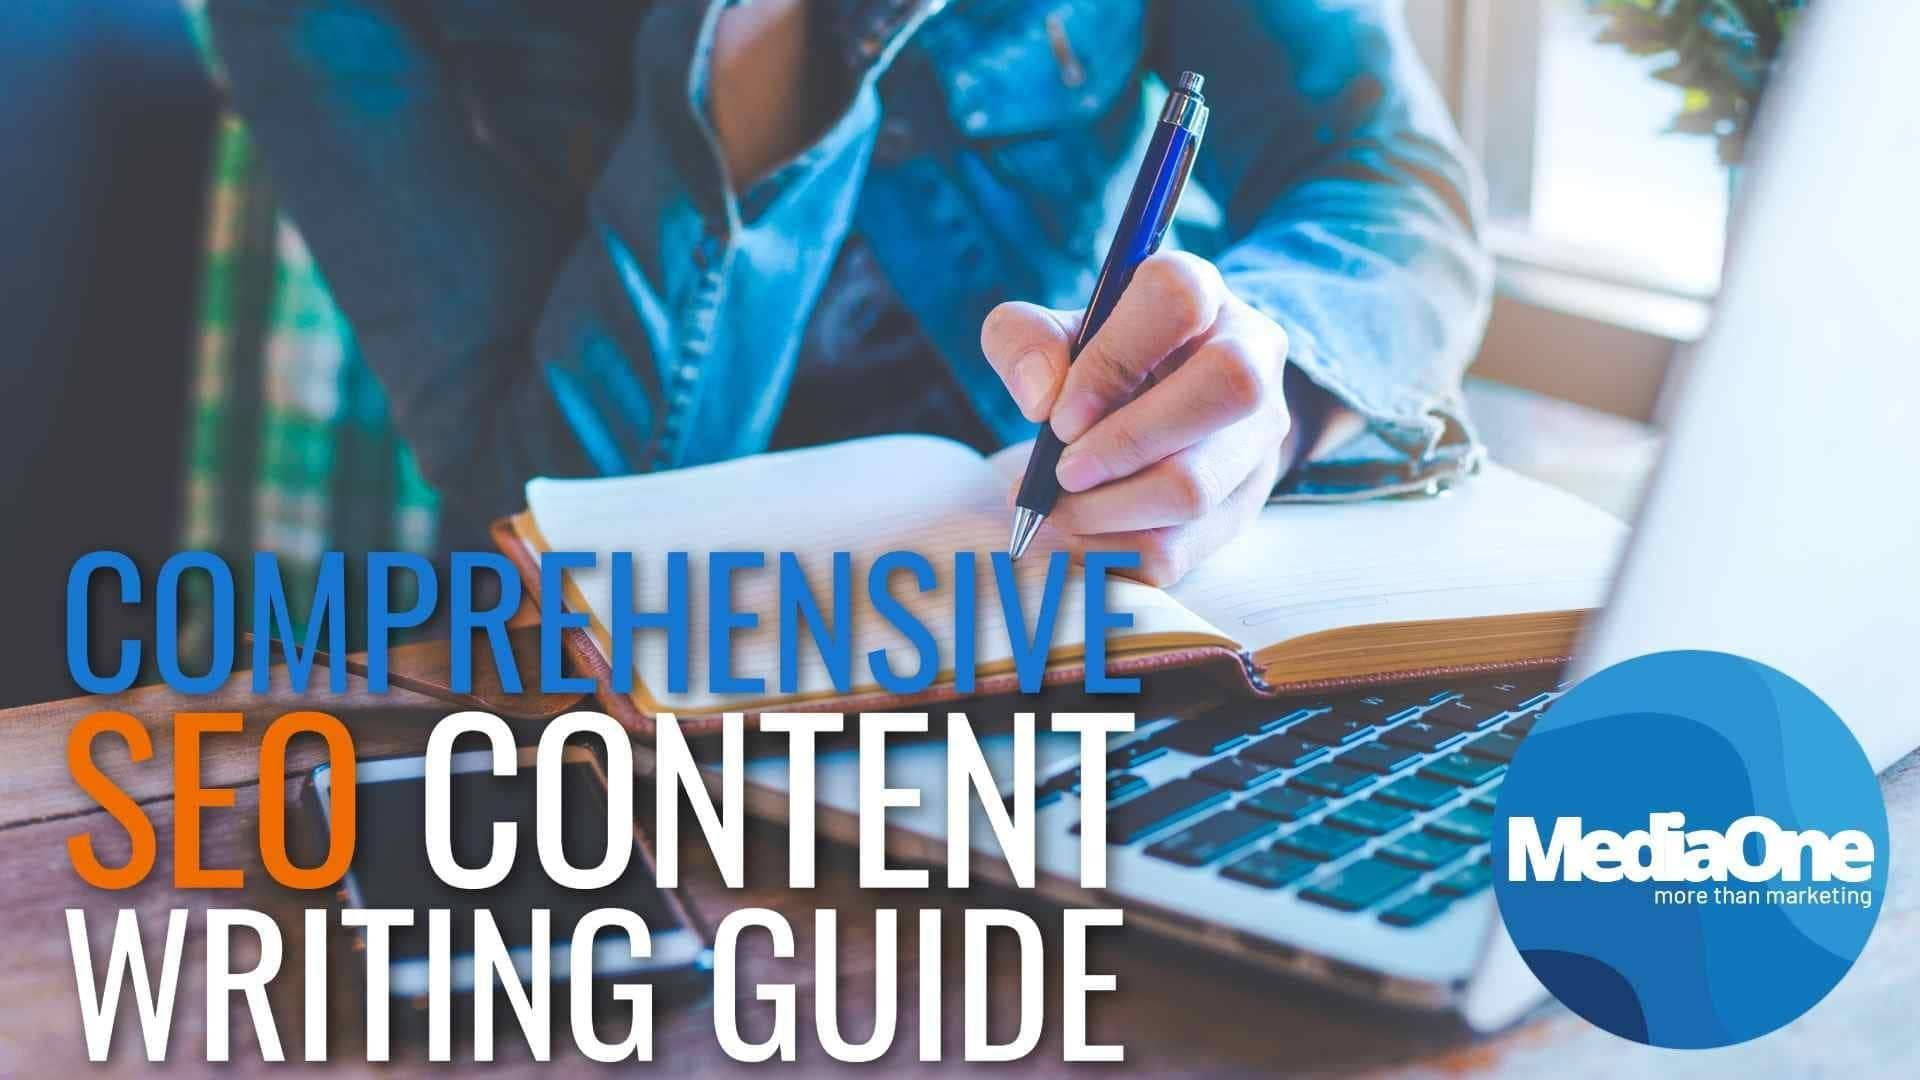 Comprehensive Singapore SEO Content Writing Guide For You